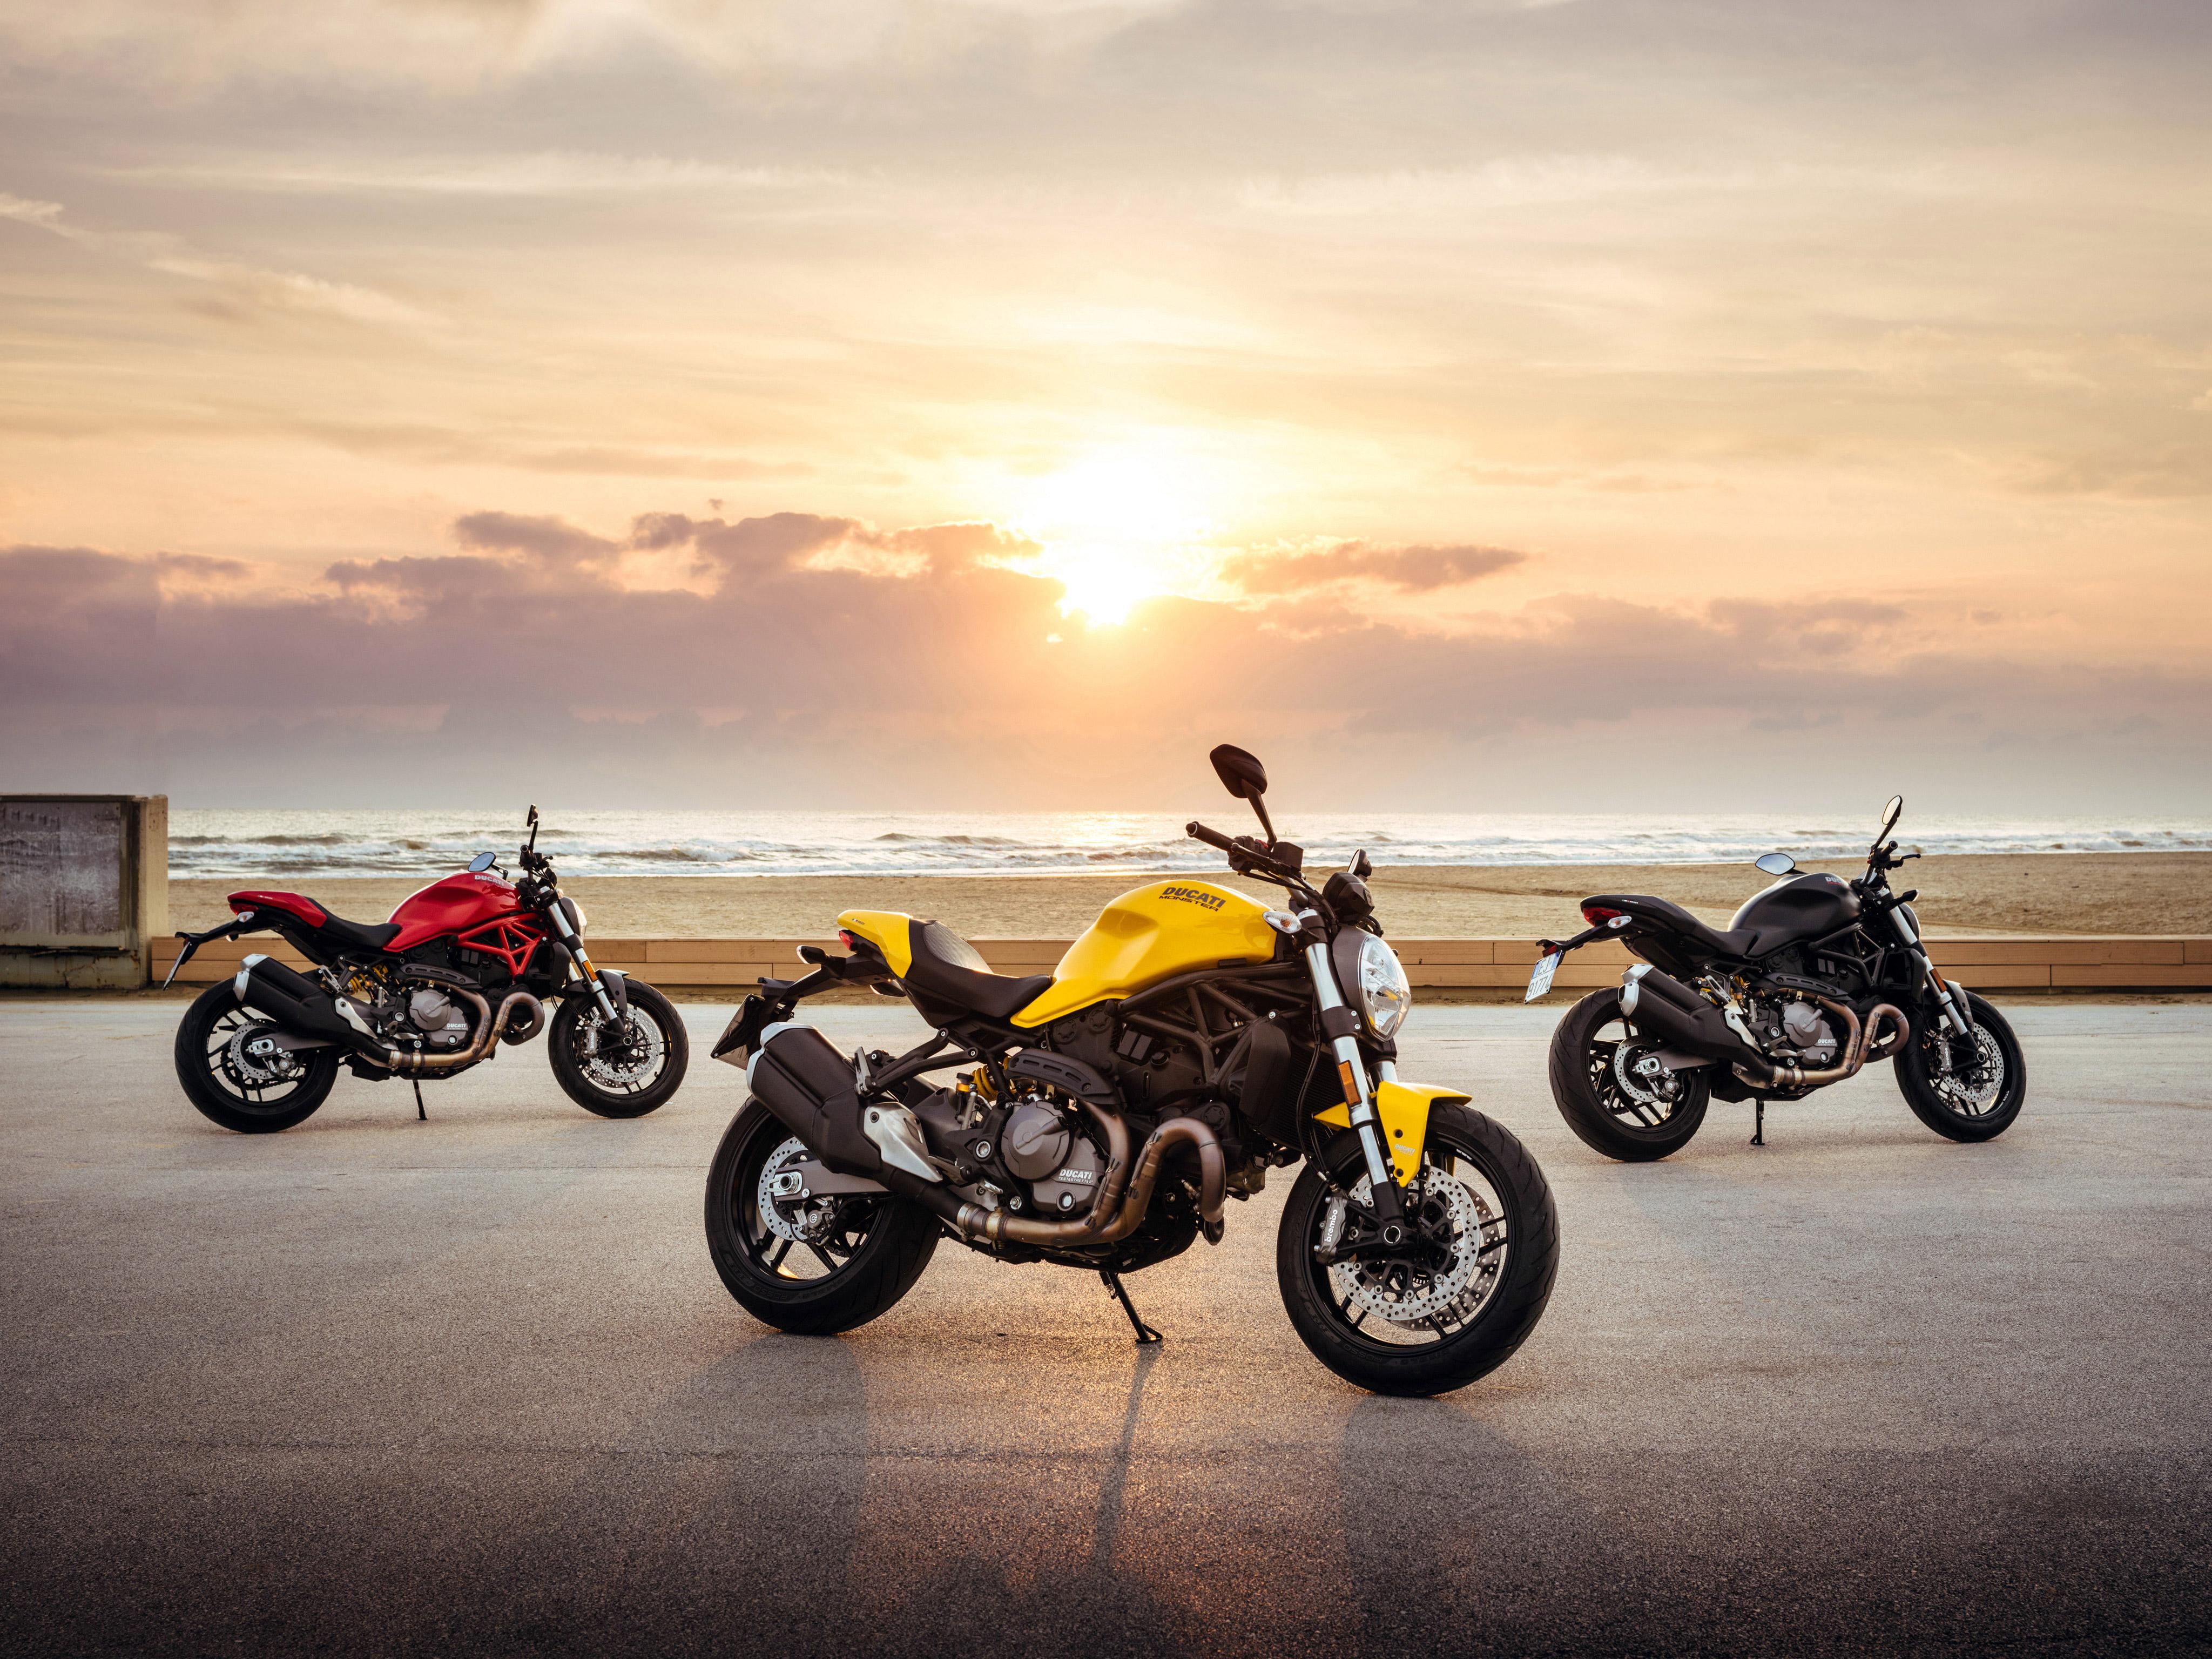 2017 ducati monster 821 4k, hd bikes, 4k wallpapers, images